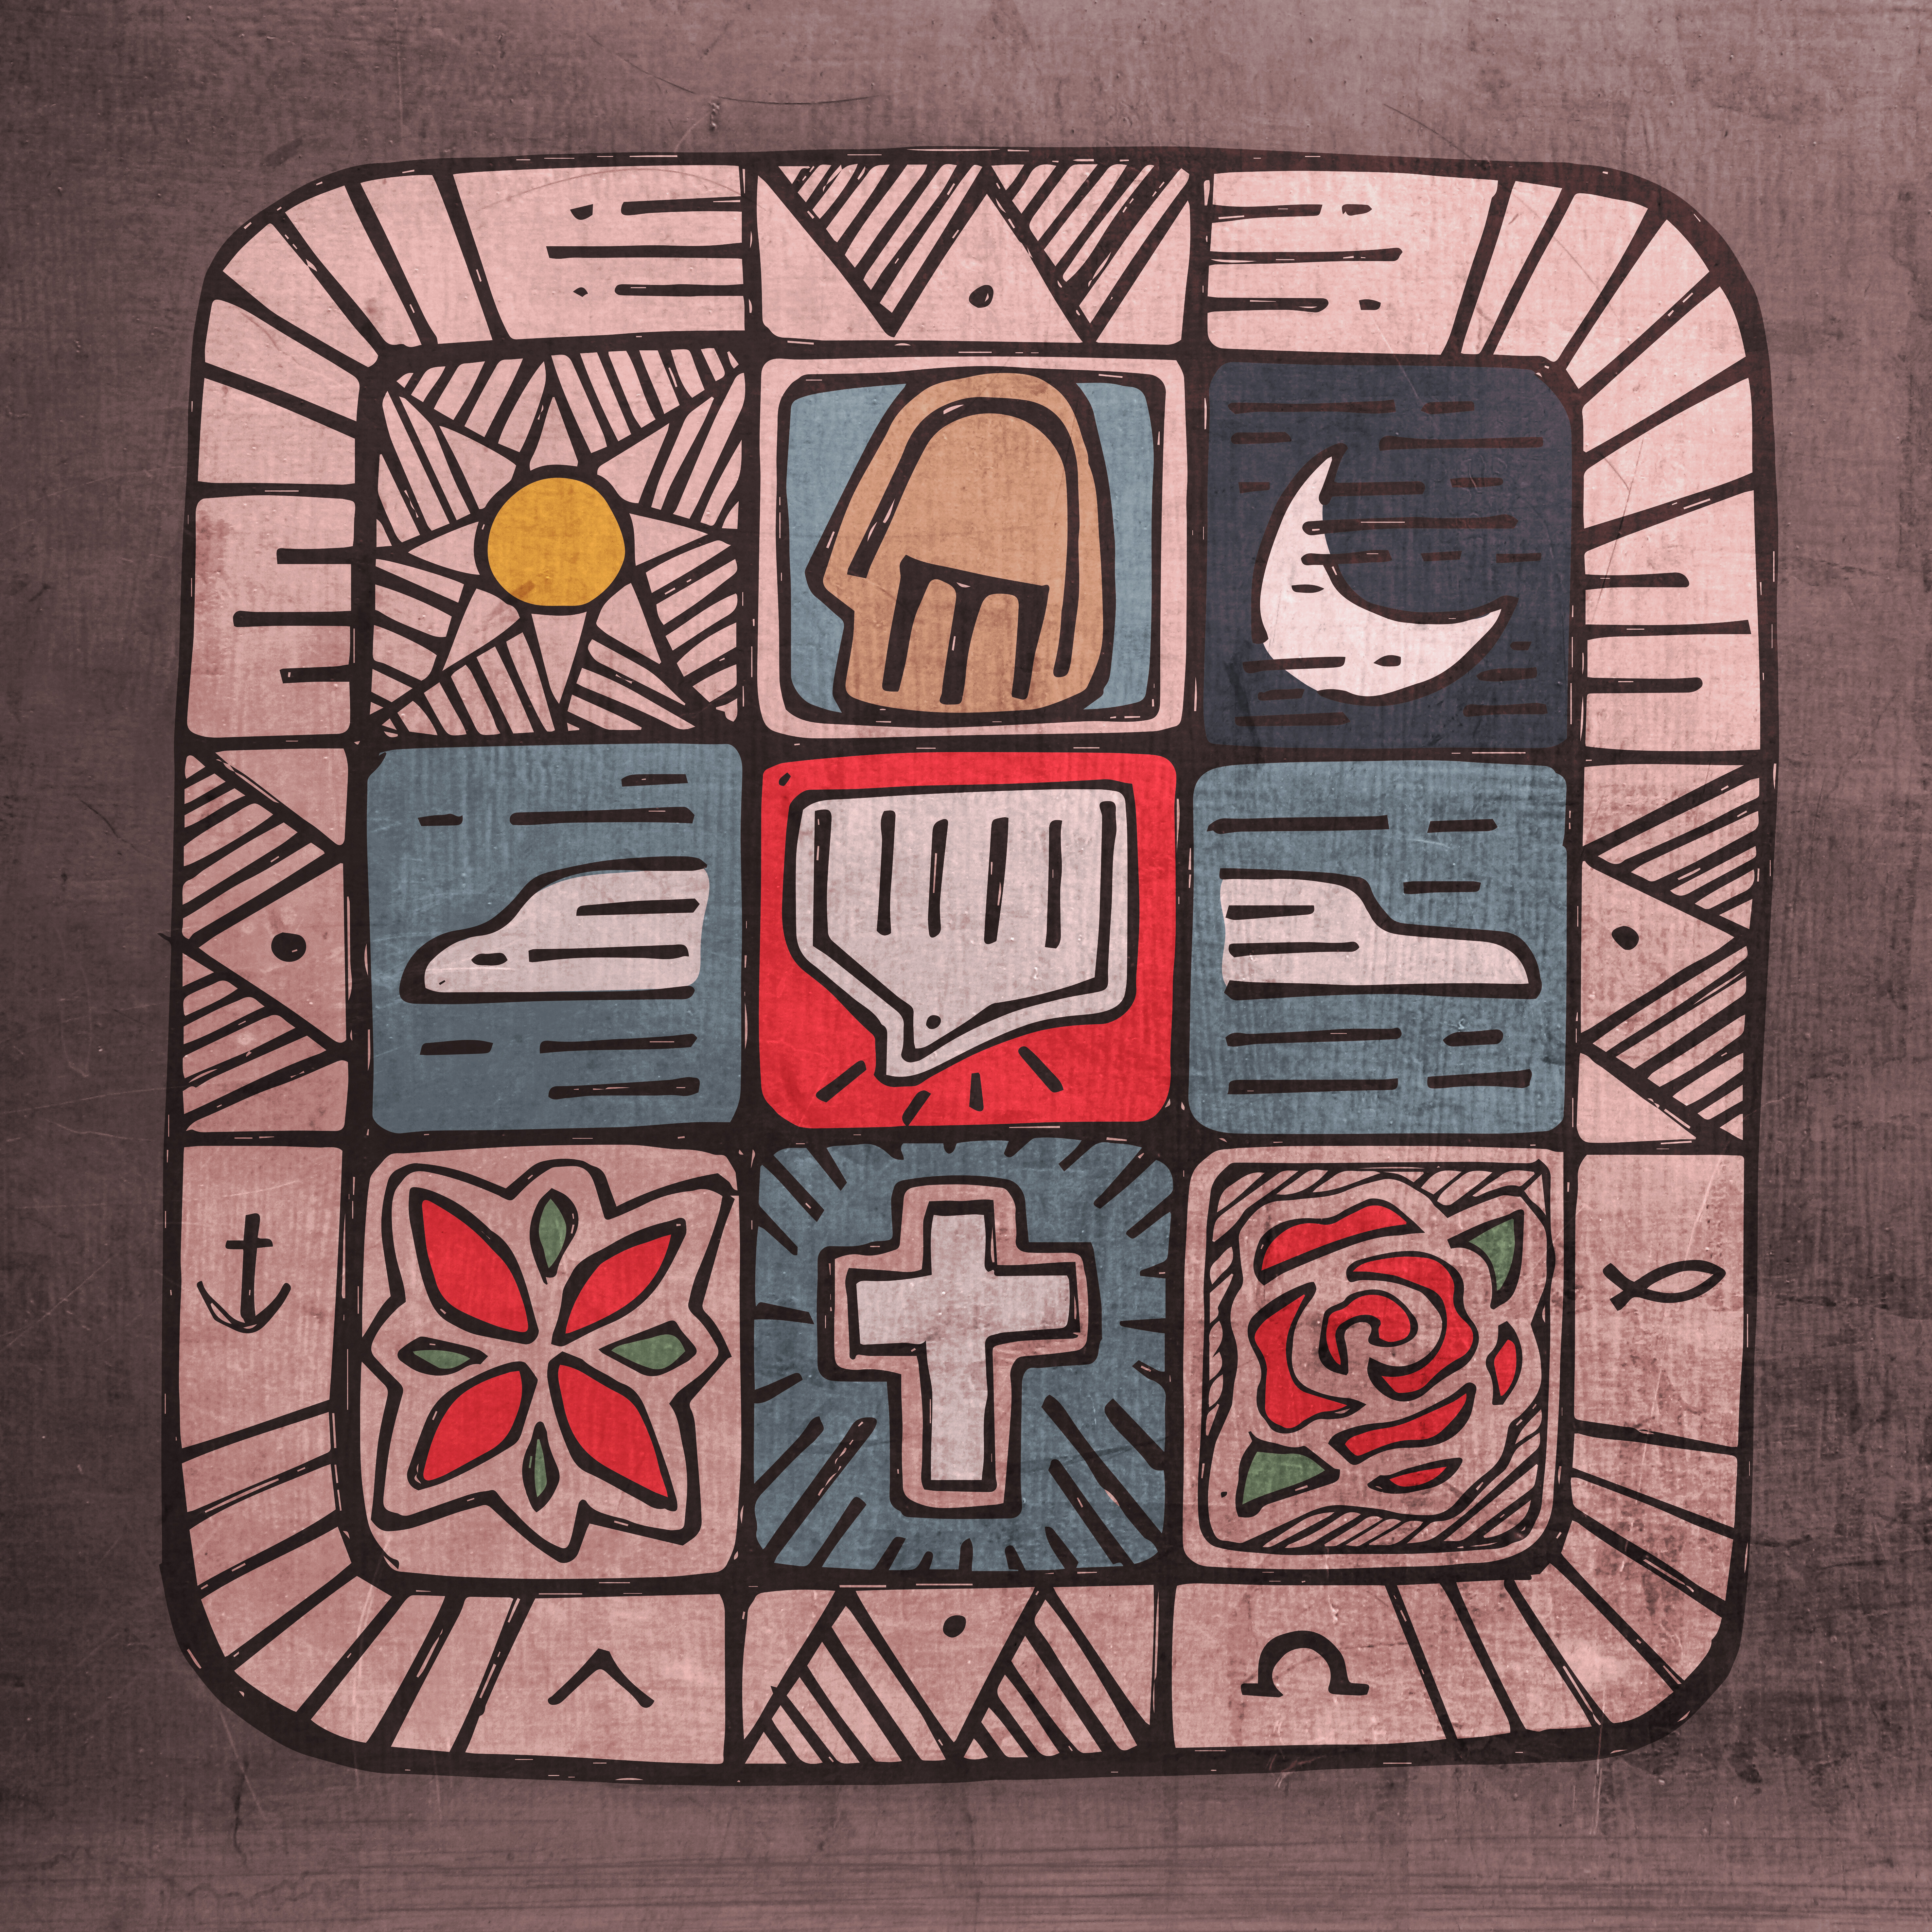 Símbolos cristianos Christiaan symbols